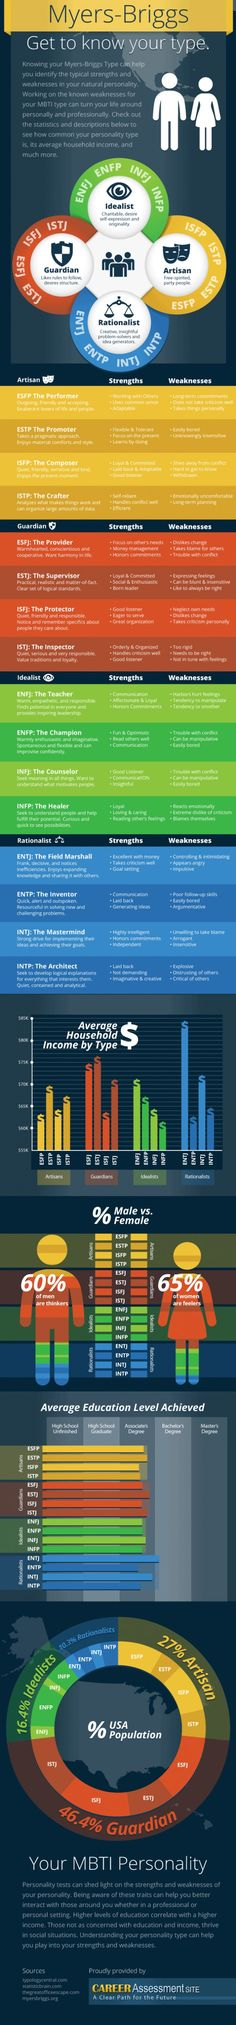 Myers-Briggs Personality Socio-Economic Status Infographic. I'm ESTJ. A speaker once said that women ESTJ's were fish swimming upstream. :)